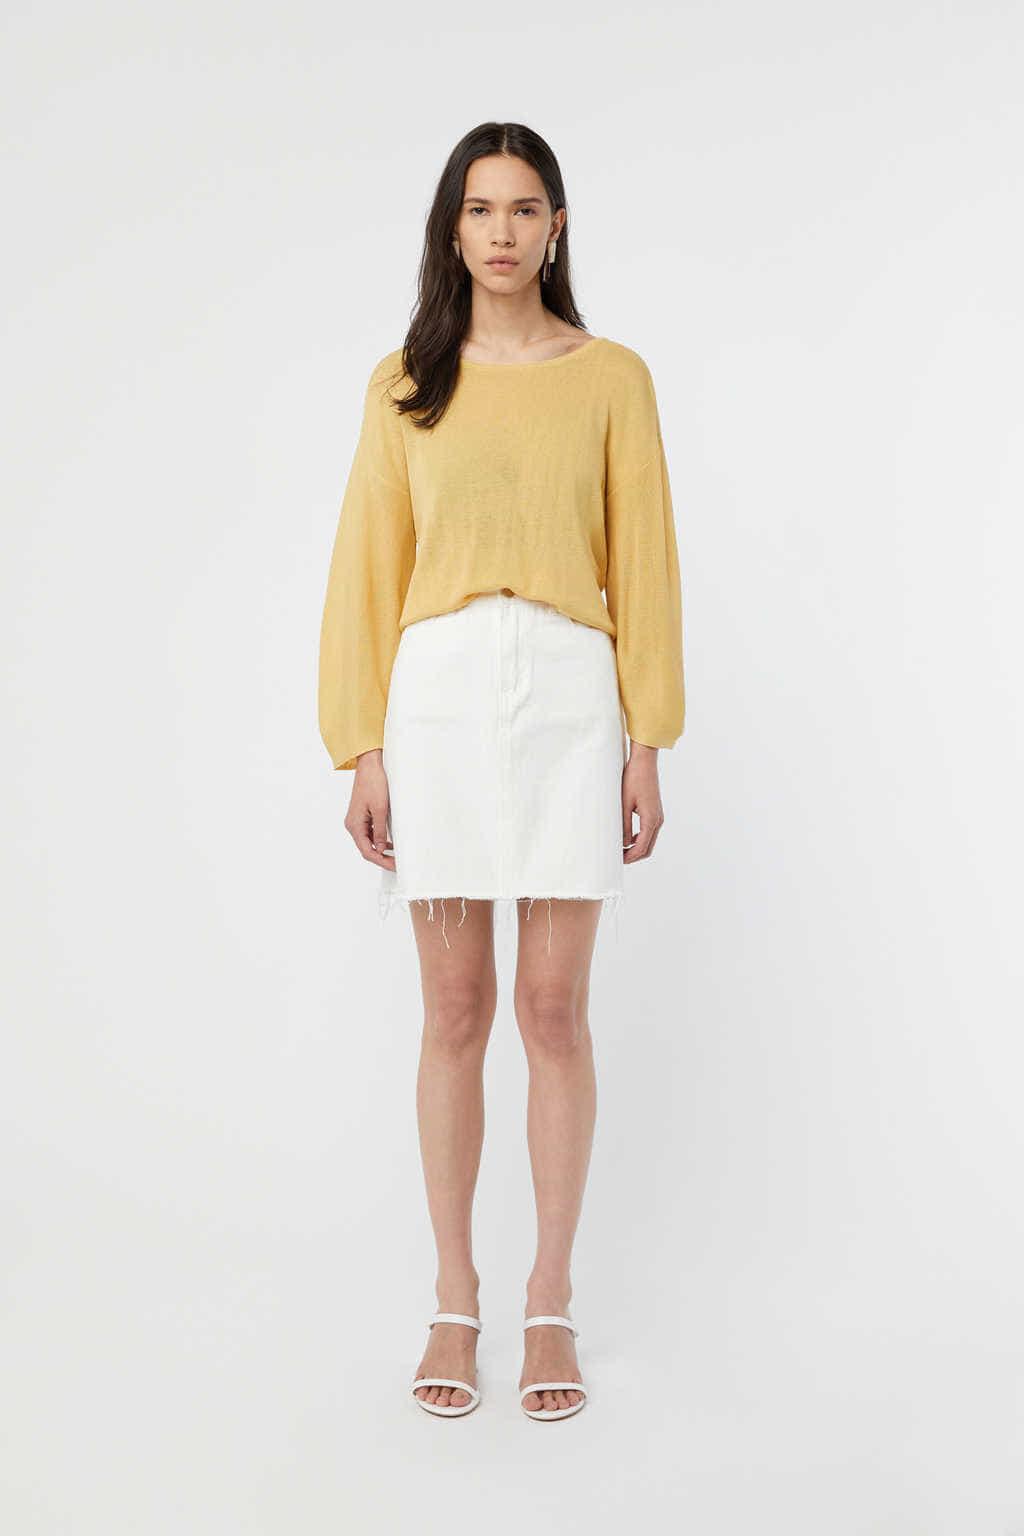 TShirt K010 Yellow 4